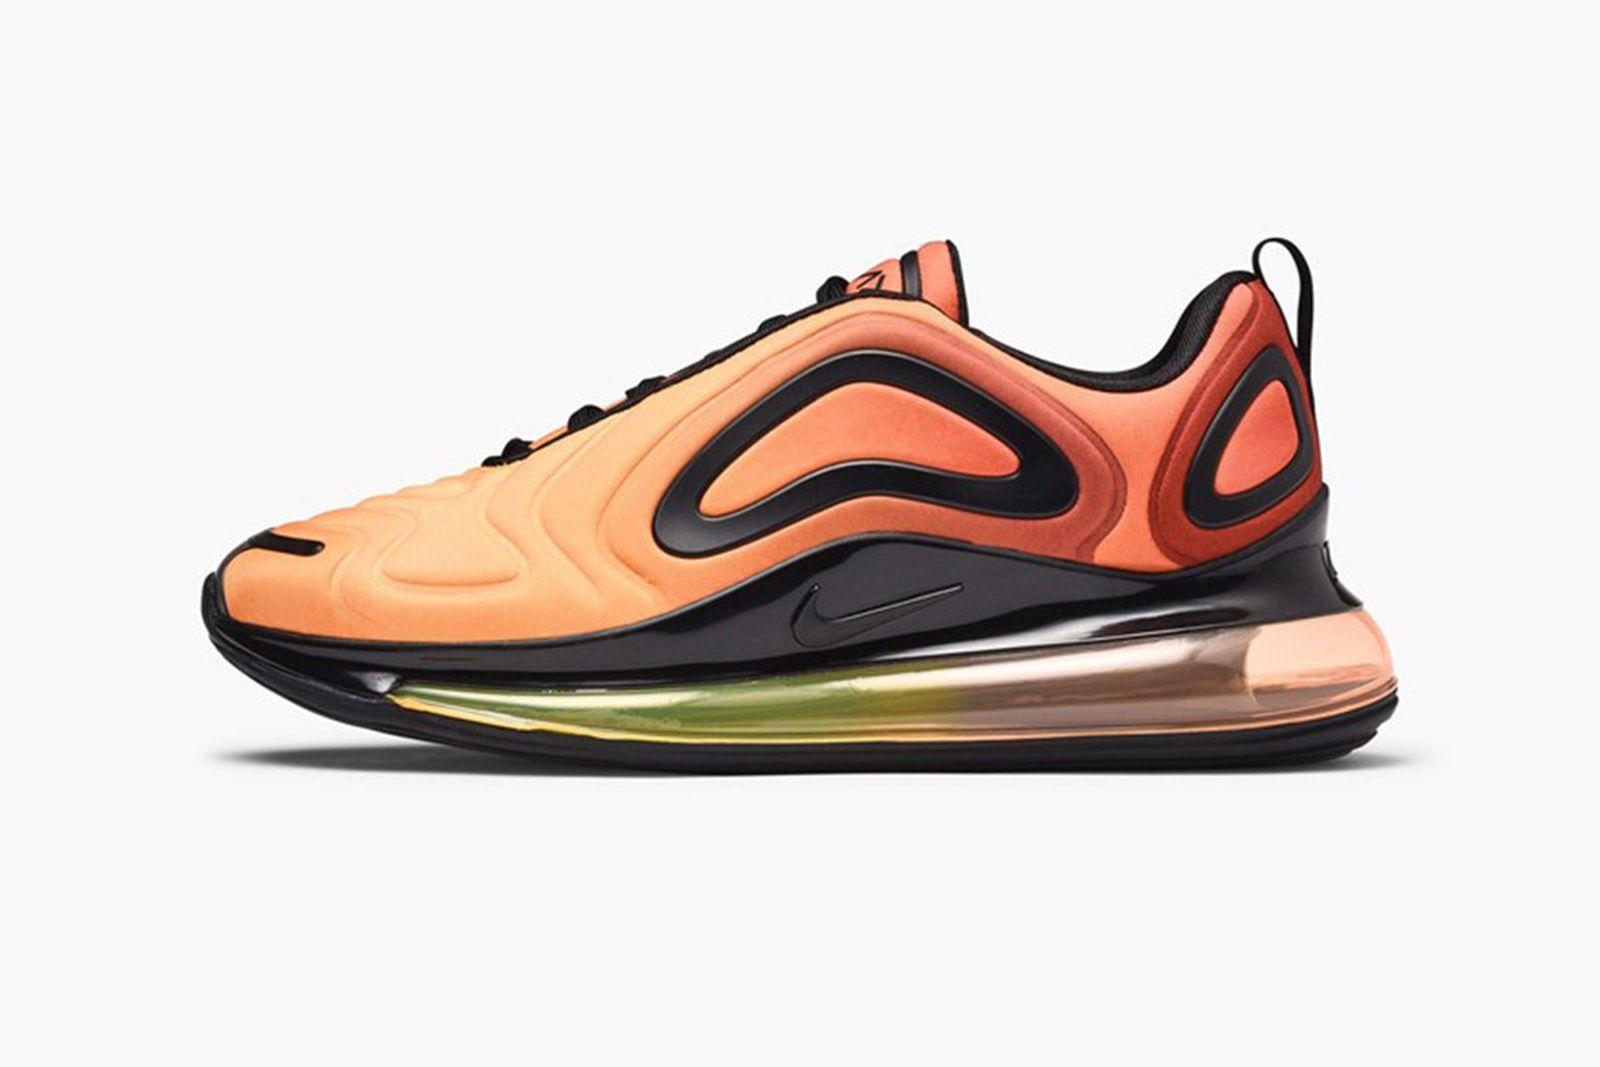 caliroots air max 270 sneaker sales